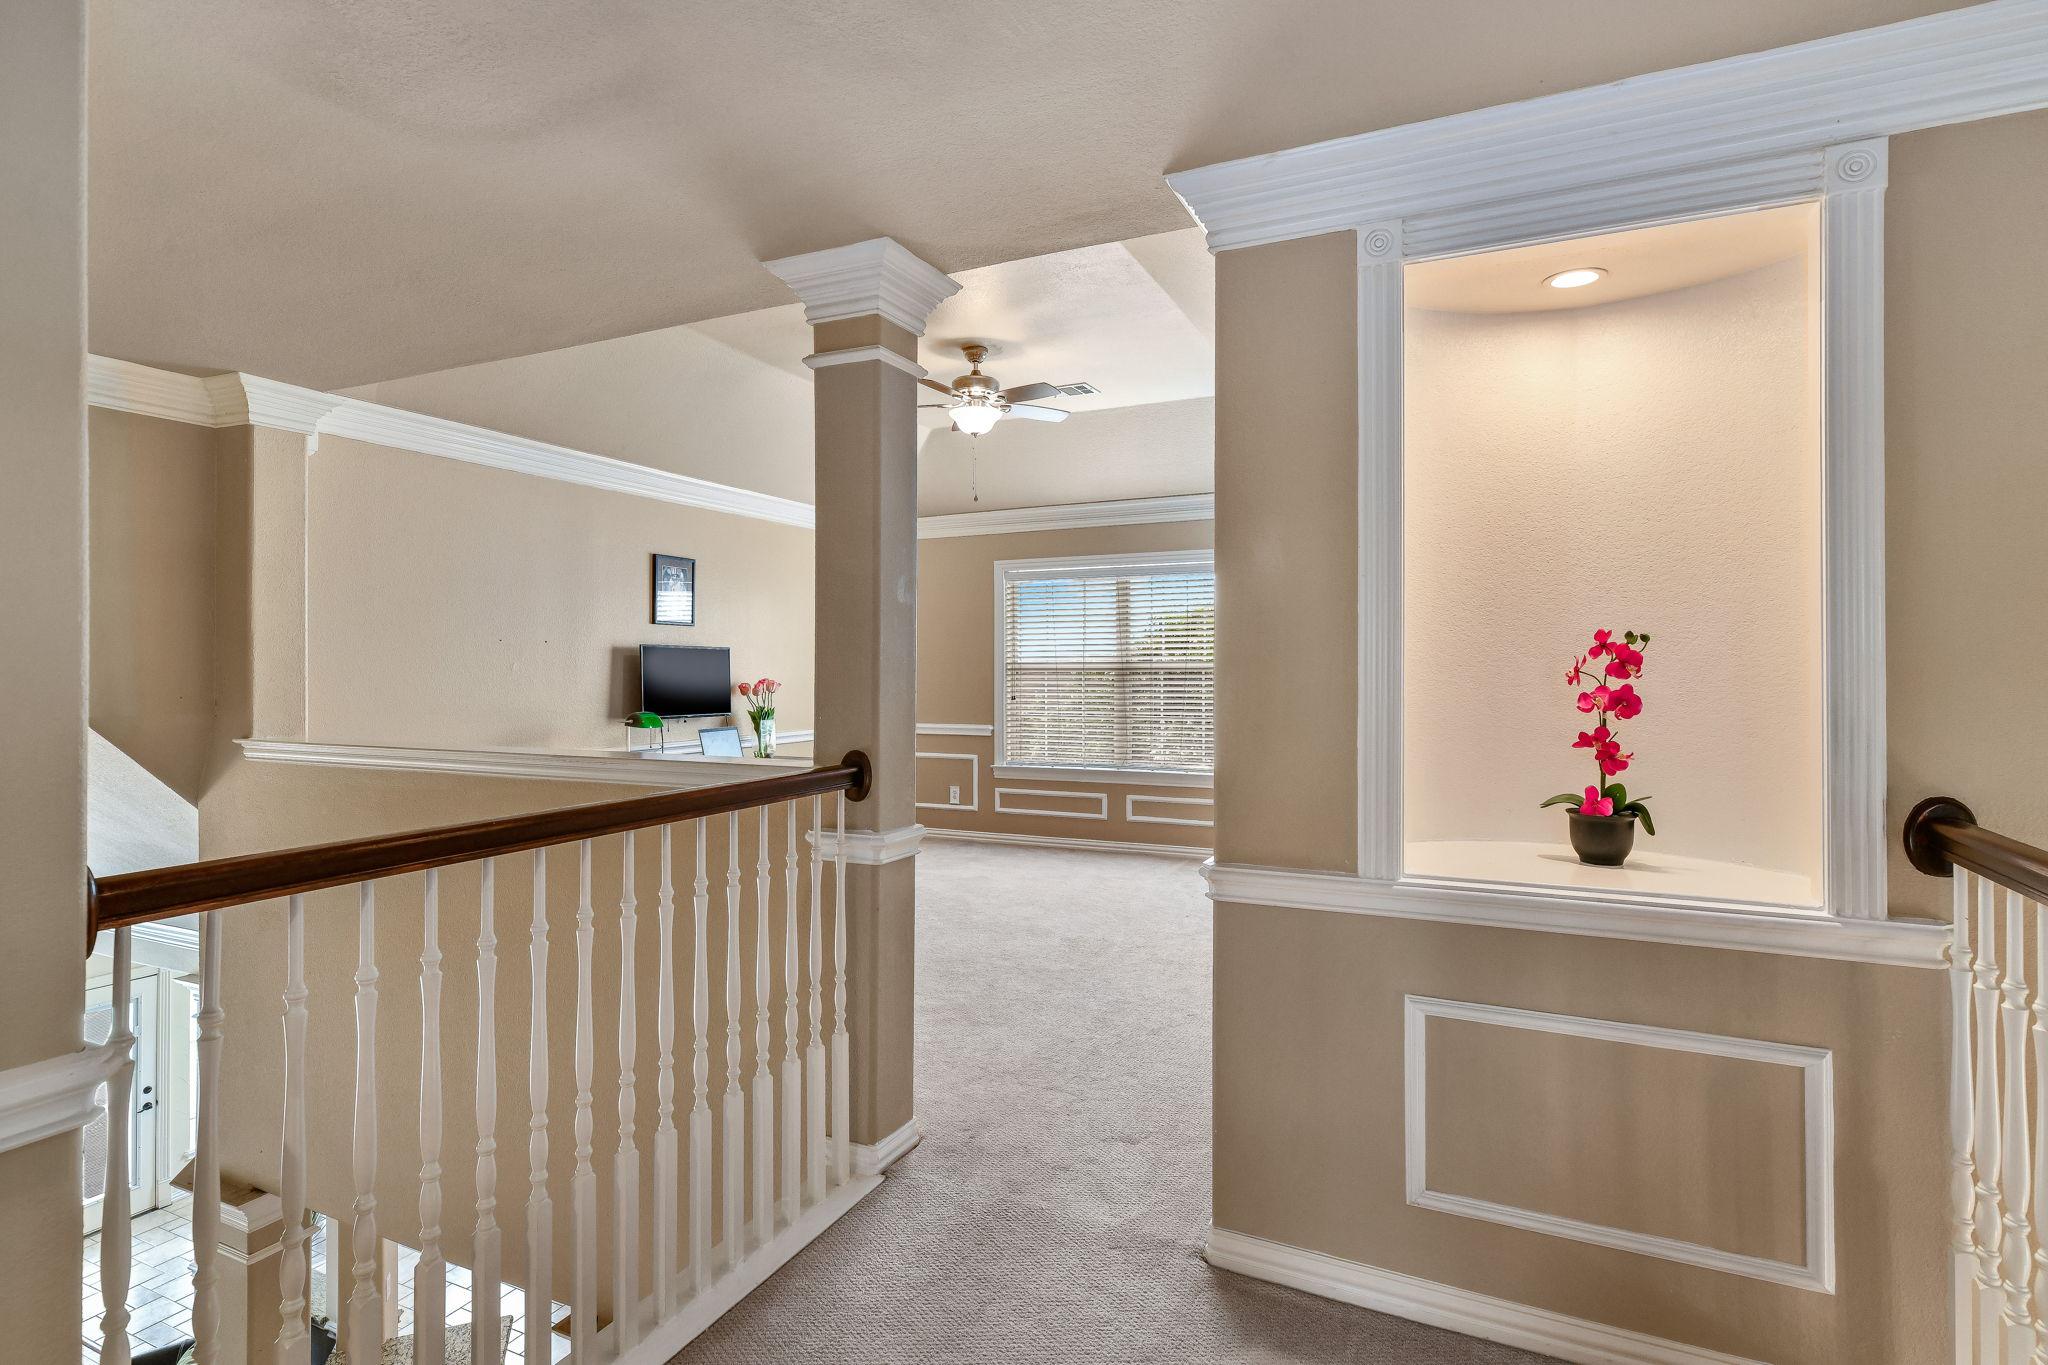 033-Upstairs Loft-FULL